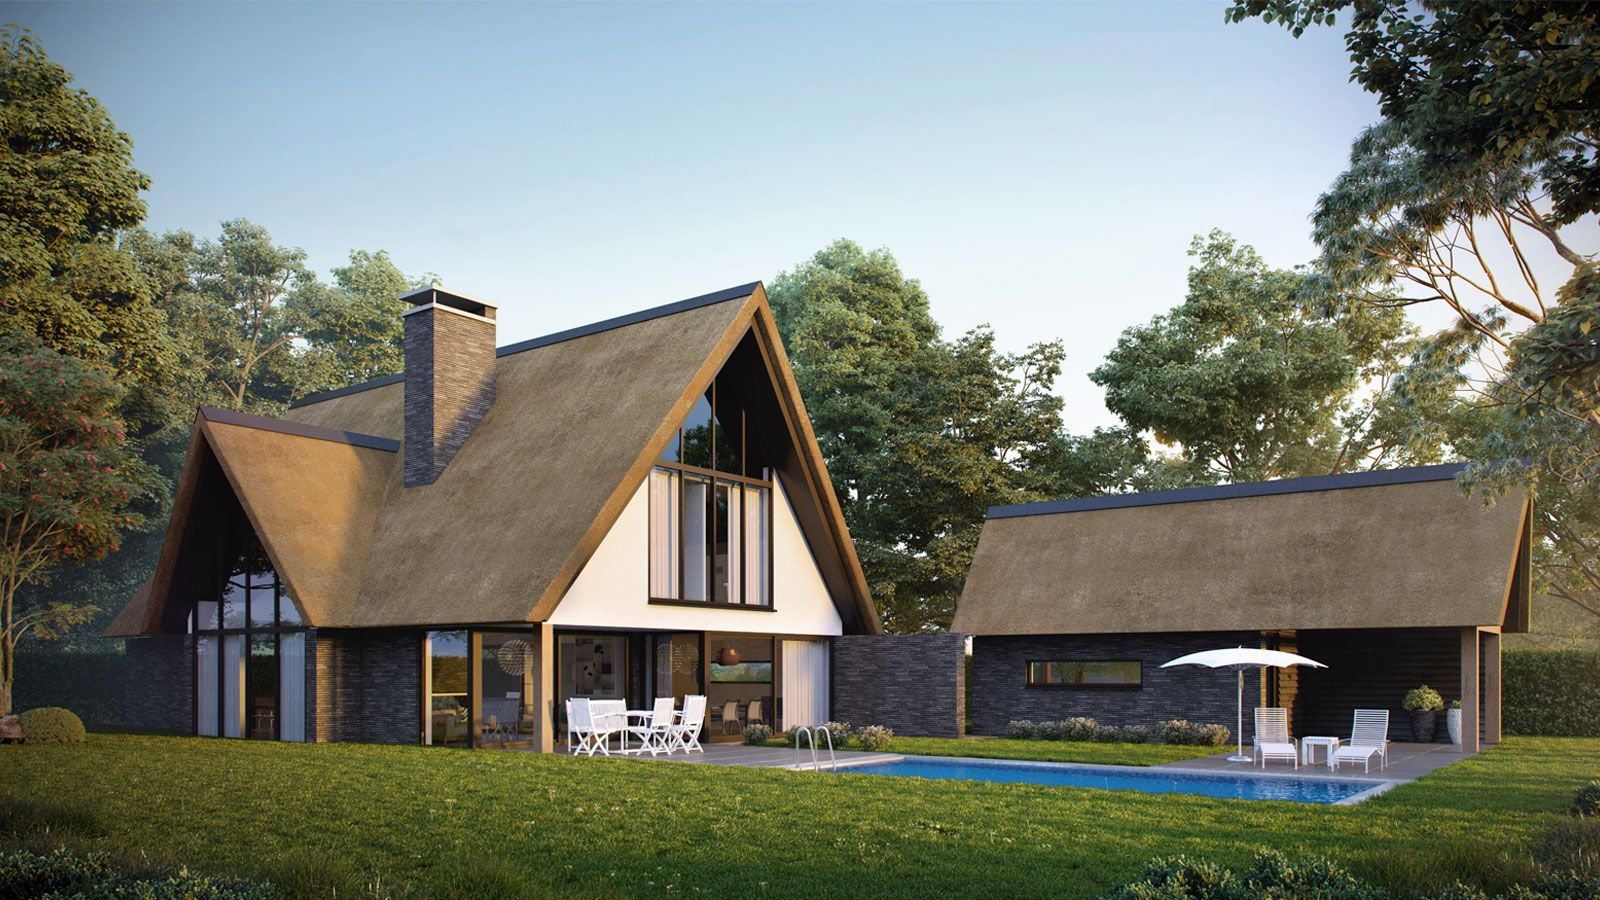 Architect Kleine Woning : Modern landelijke woning ede bongers architecten bna small houses